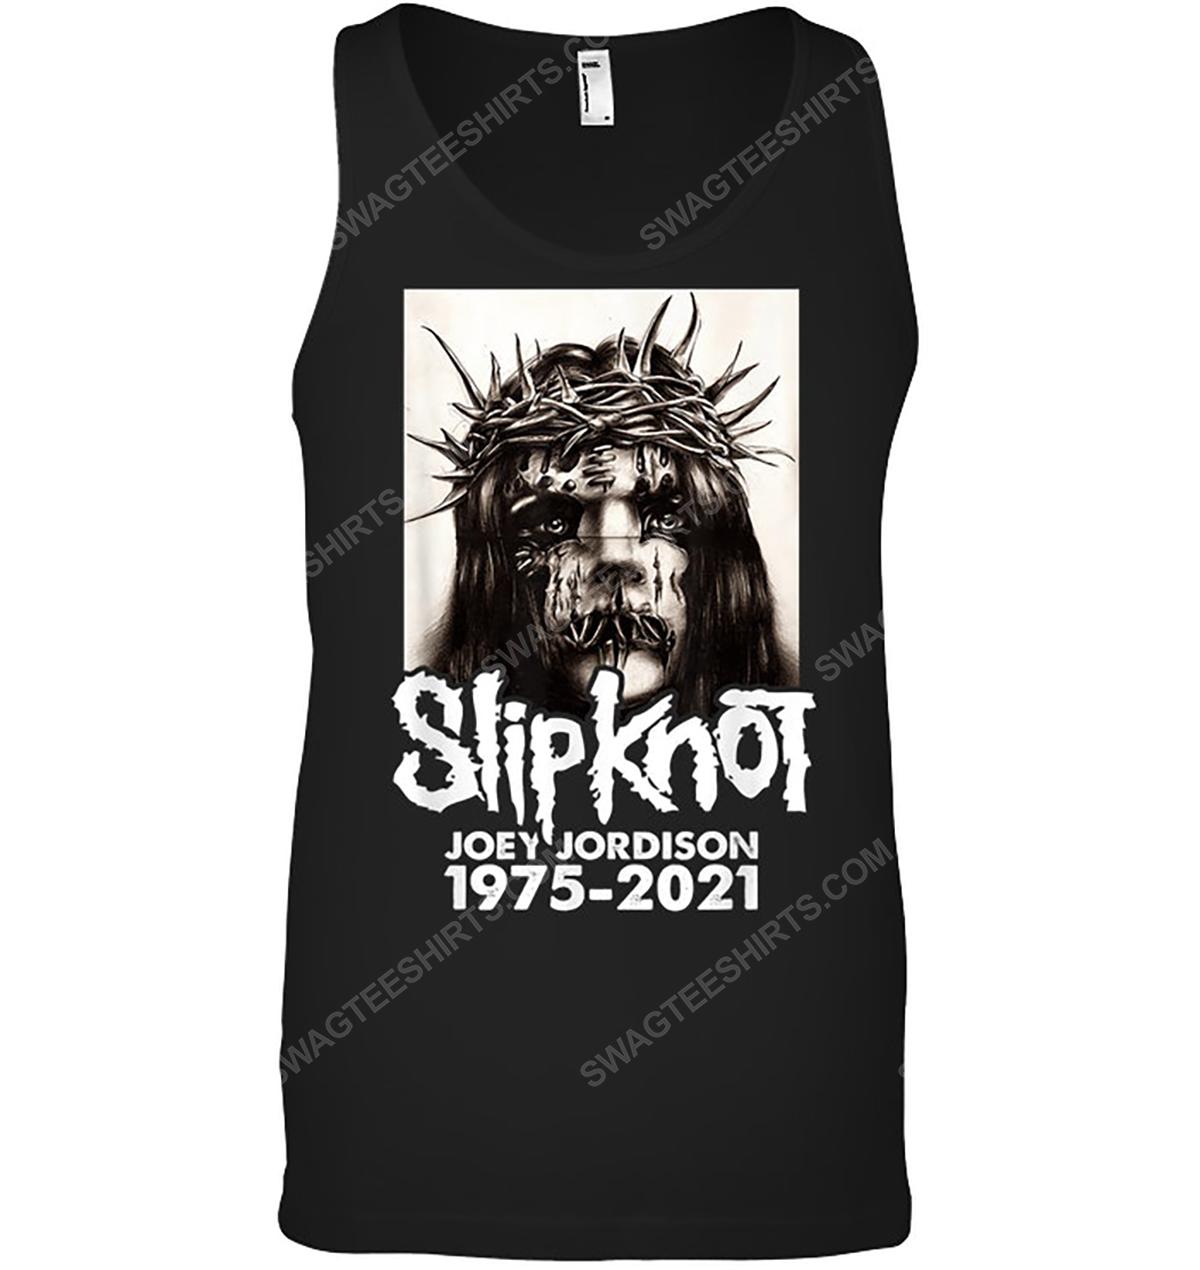 Rock band slipknot joey jordison 1975 2021 tank top 1